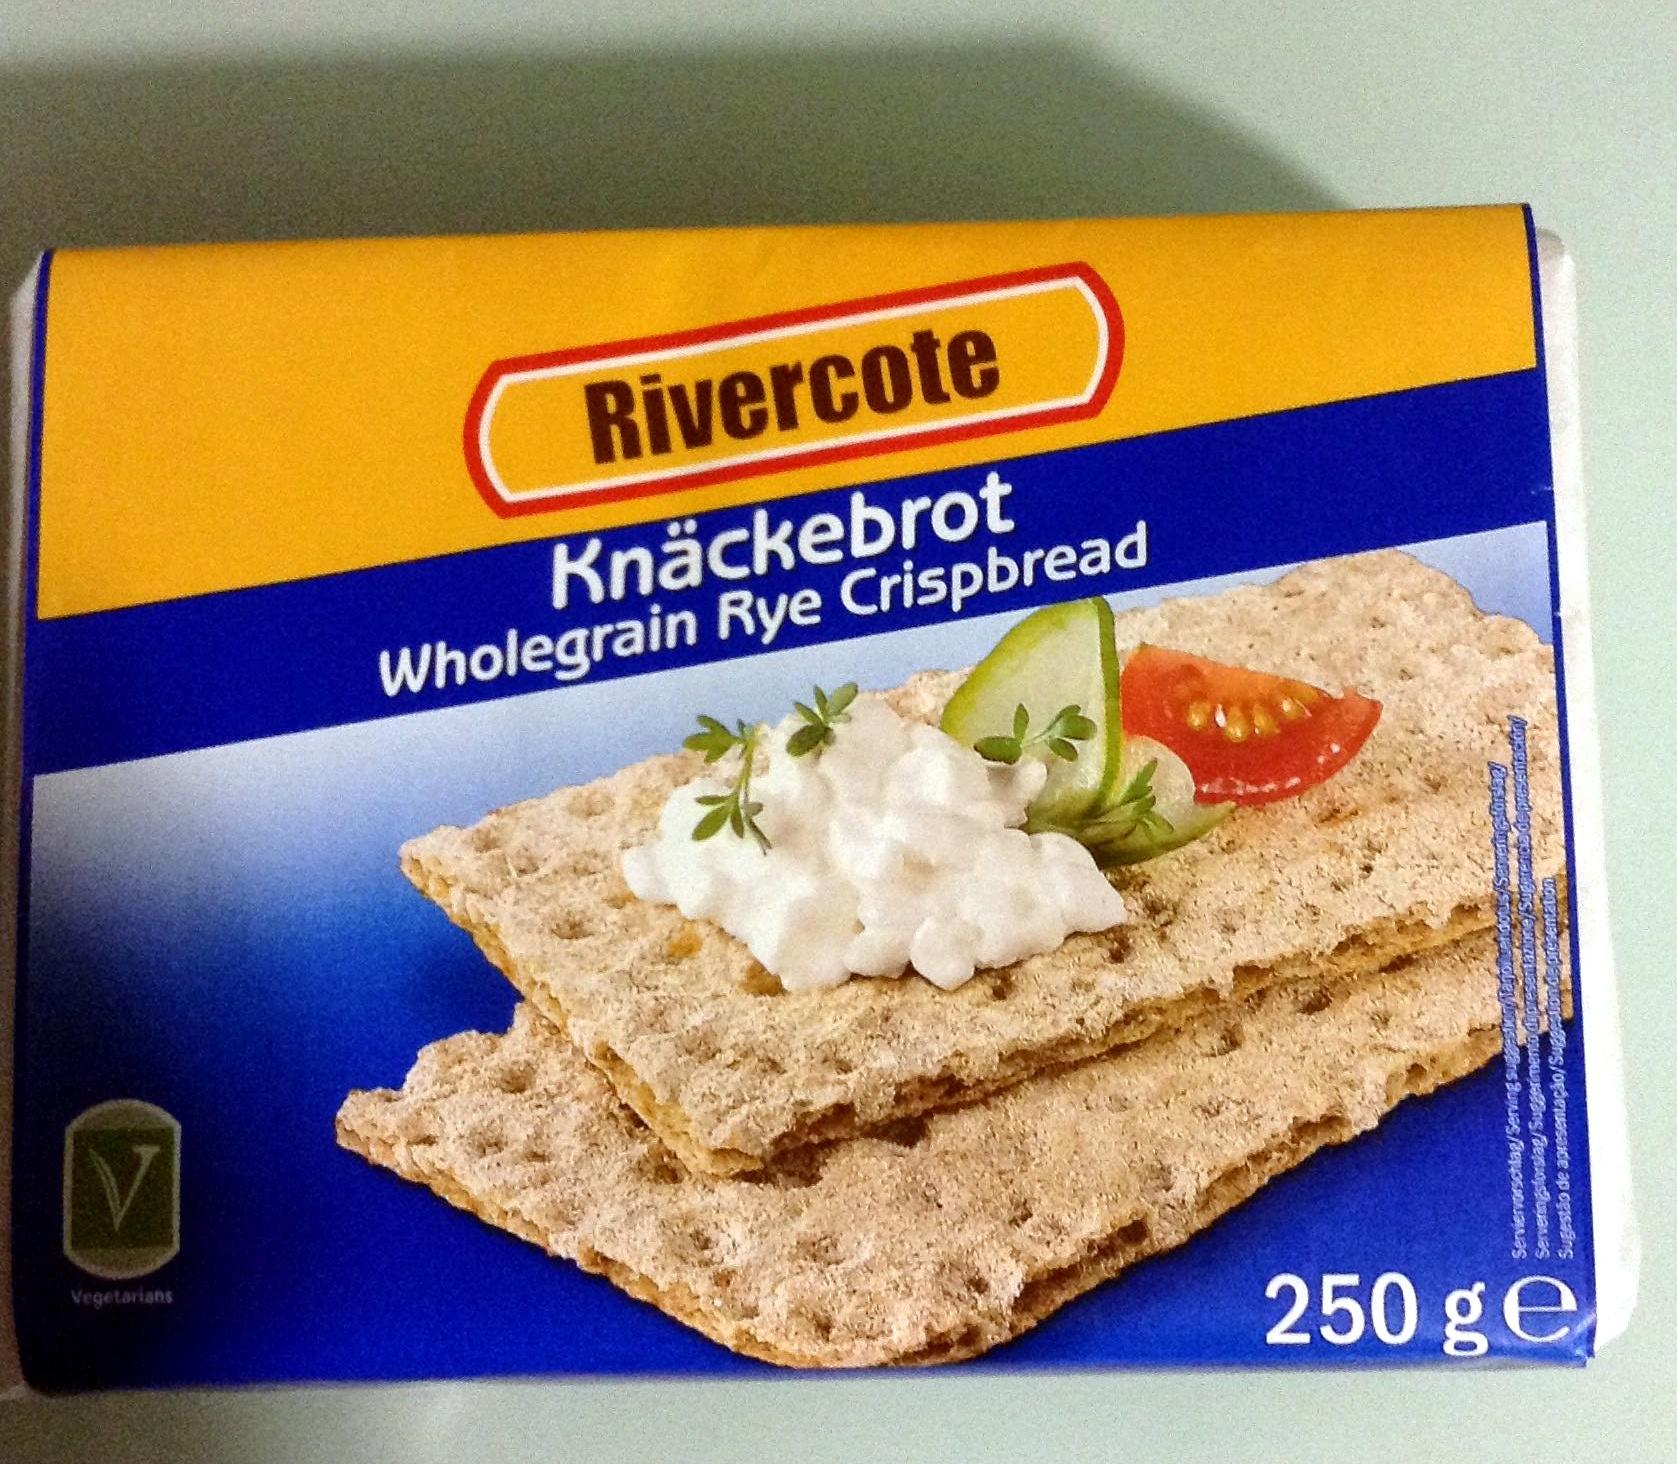 Knäckebrot Wholegrain Rye Crispbread - Product - pt